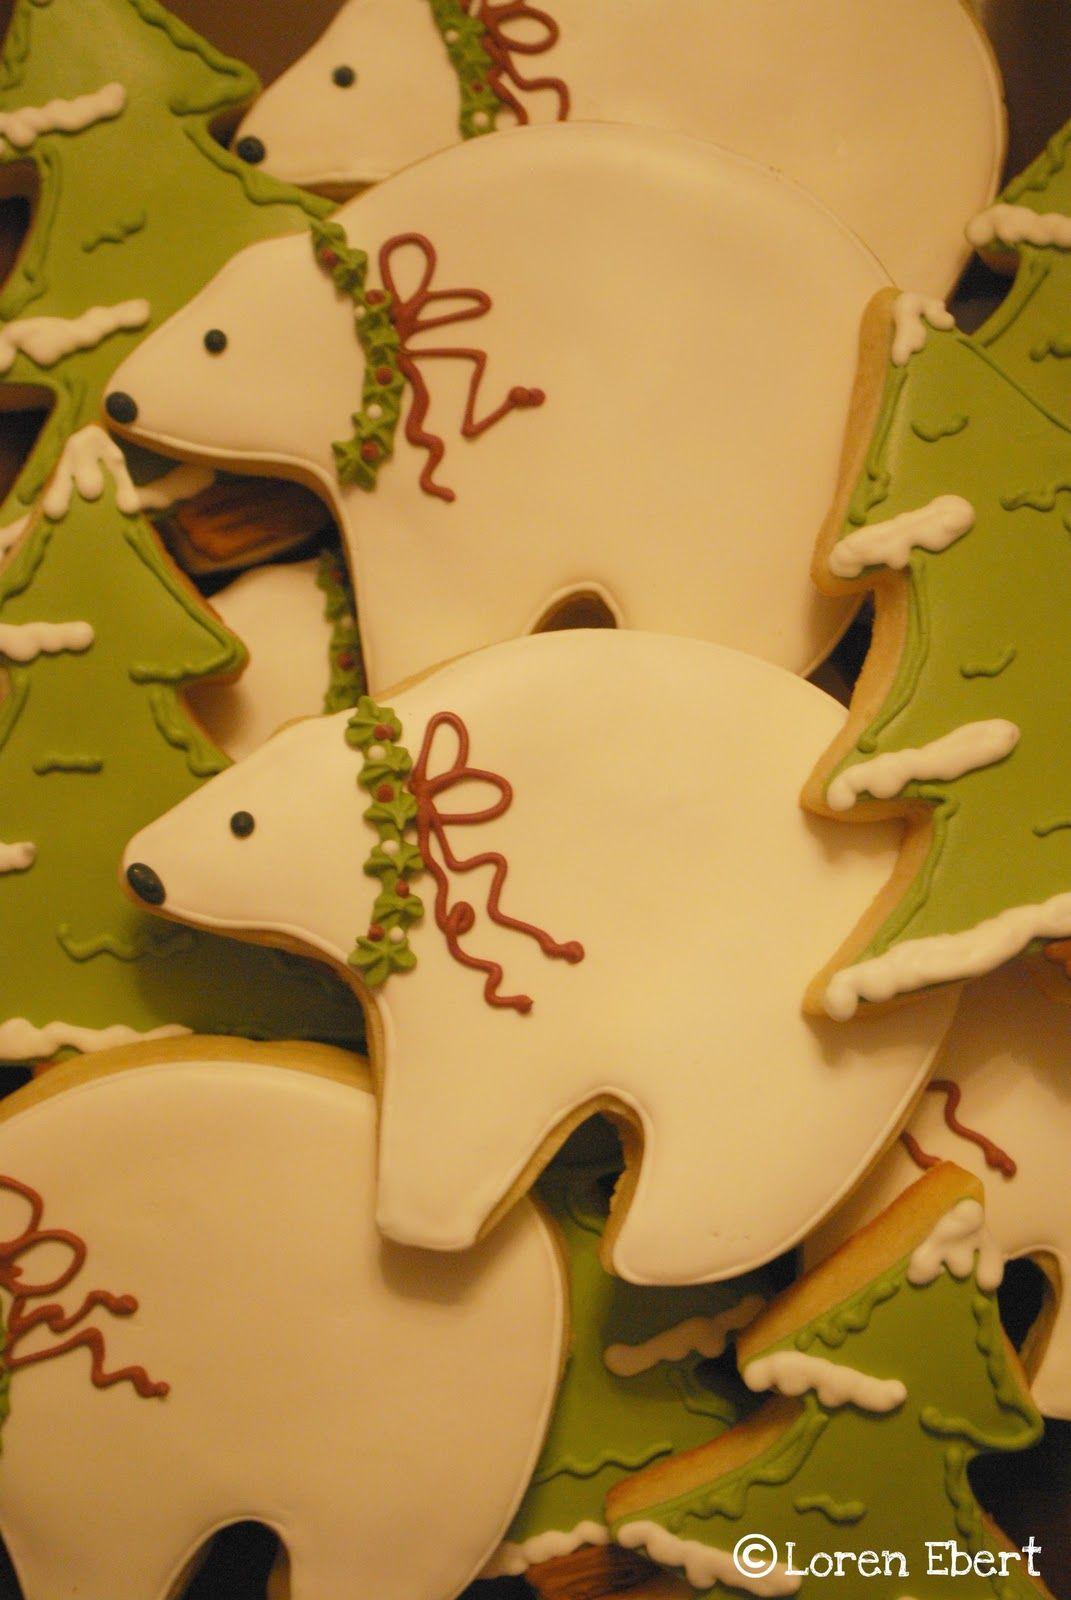 Aol mail simple free fun christmas sugar cookies